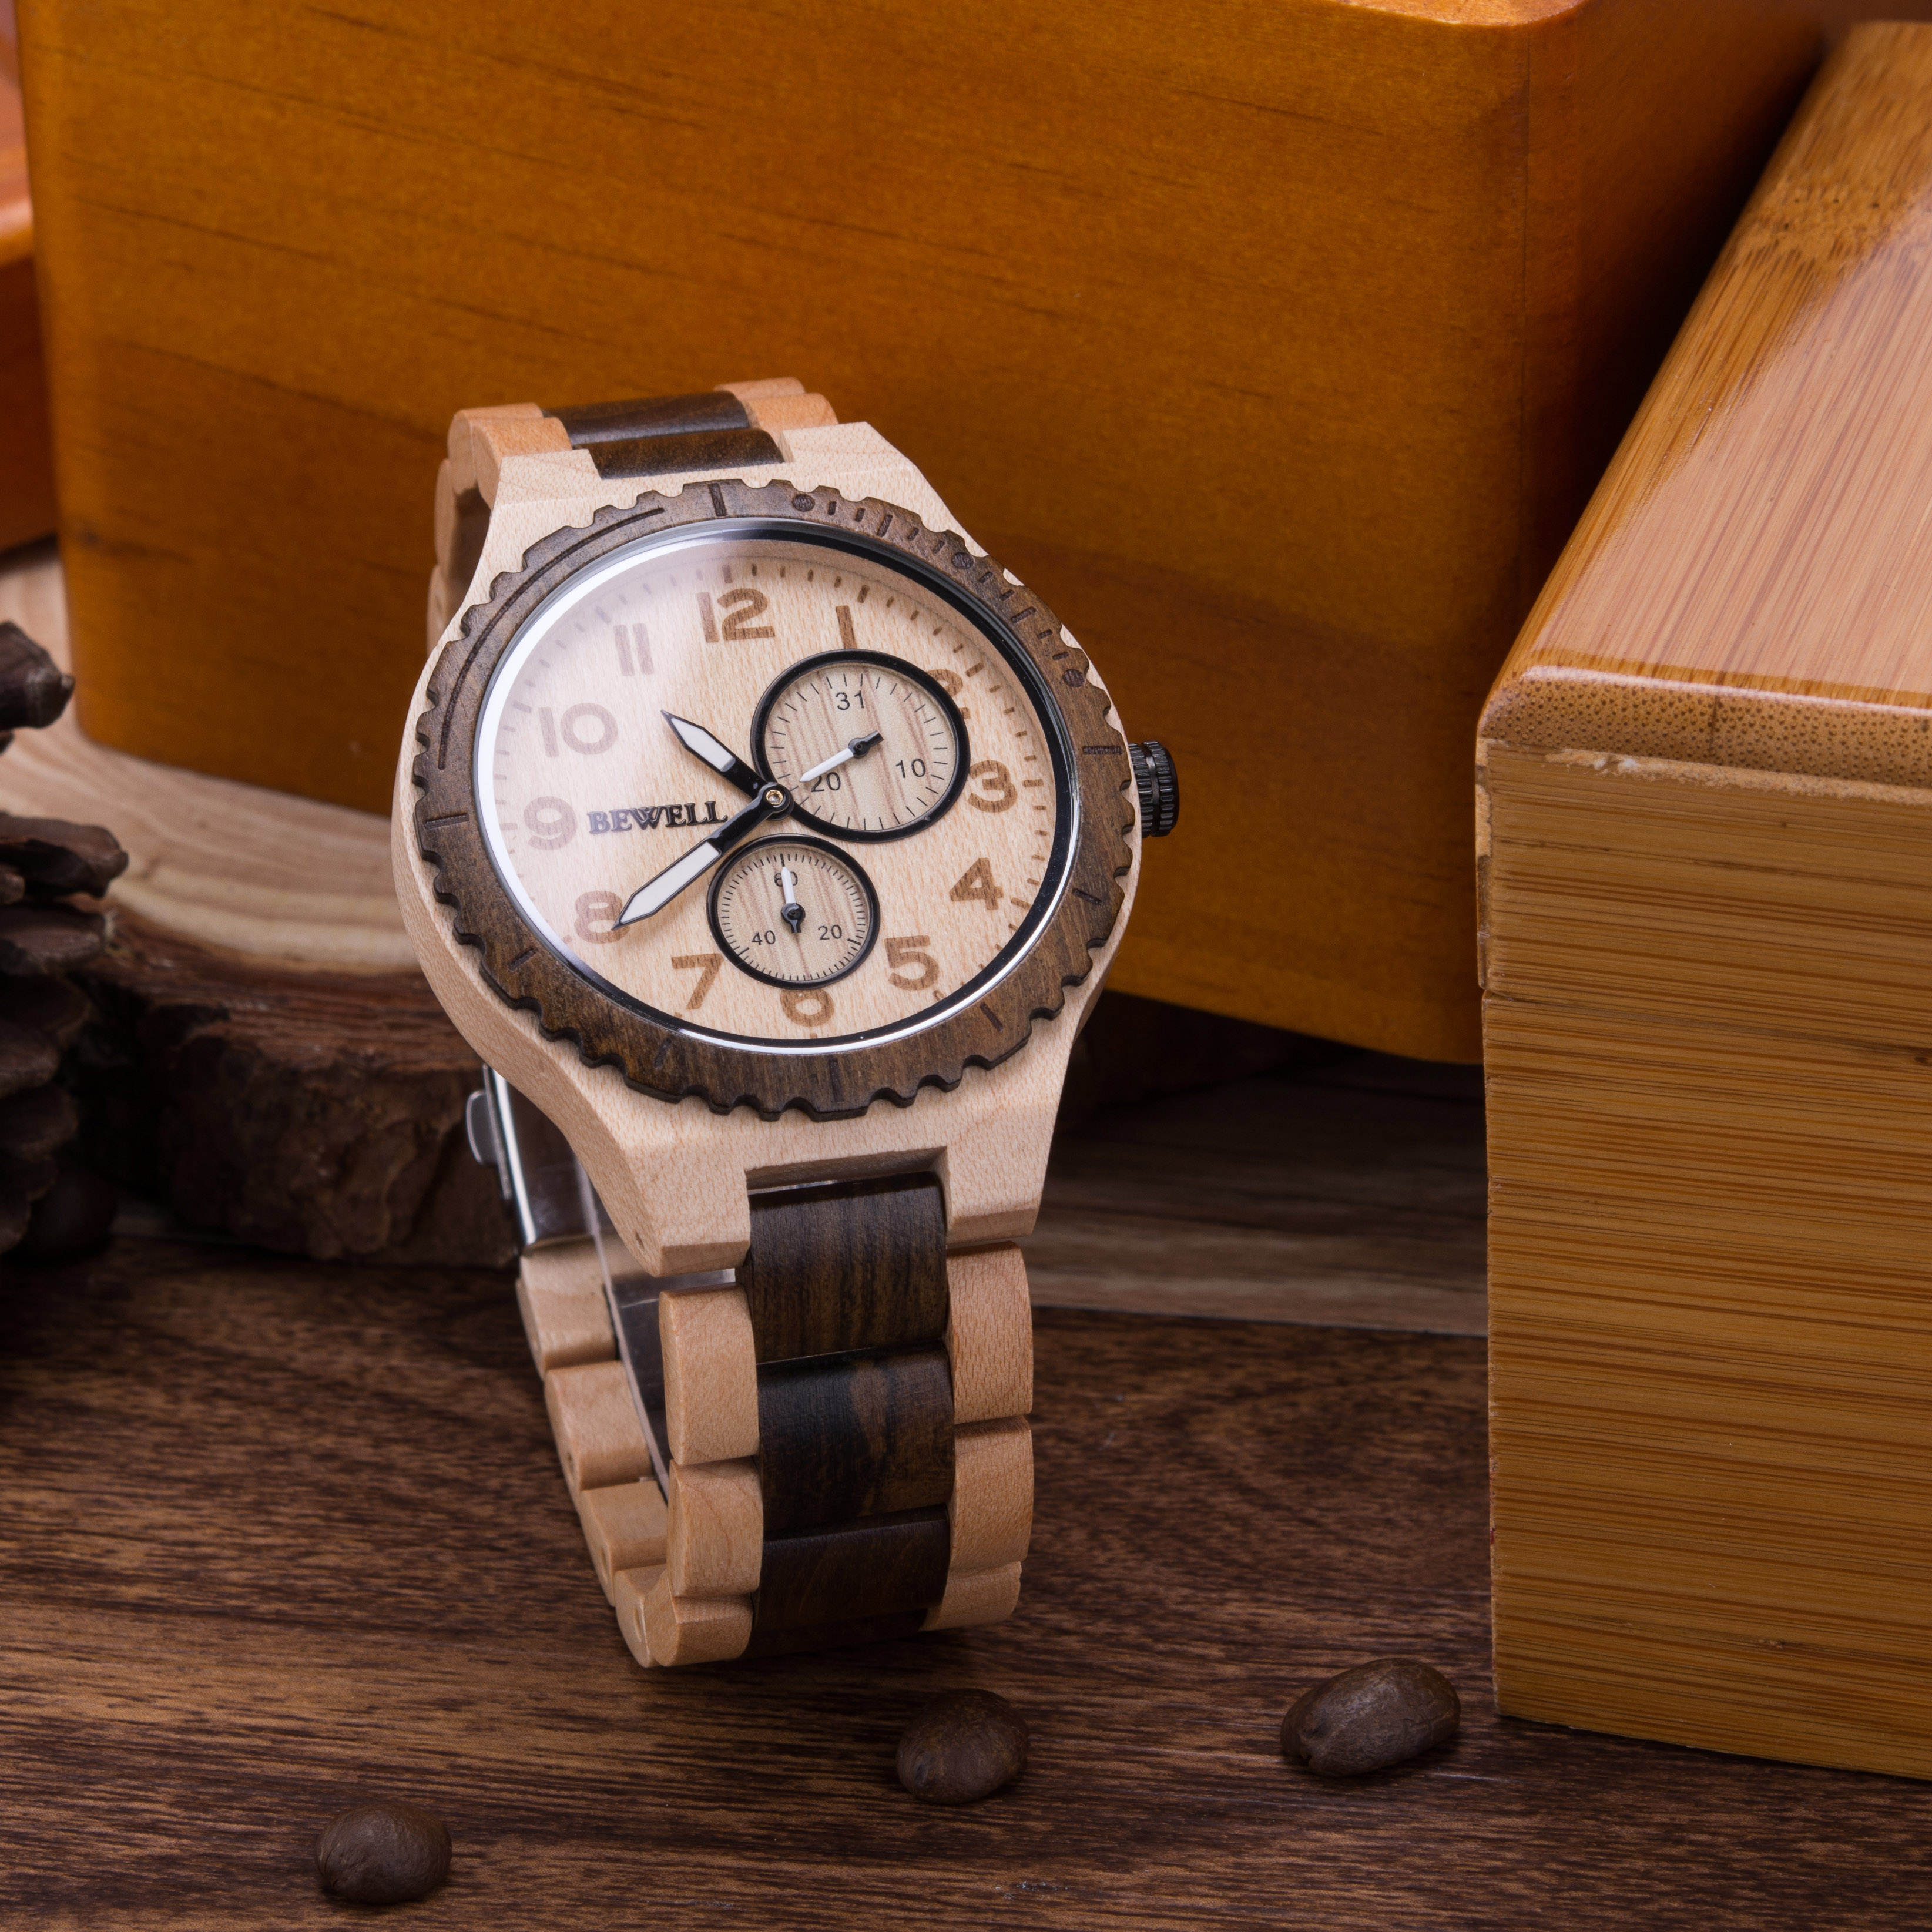 BEWELL Wooden Watch Men Quartz Date Casual Retro reloj hombre Lightweight Luminous Wood Watches for Men Relogio Masculino W154A enlarge